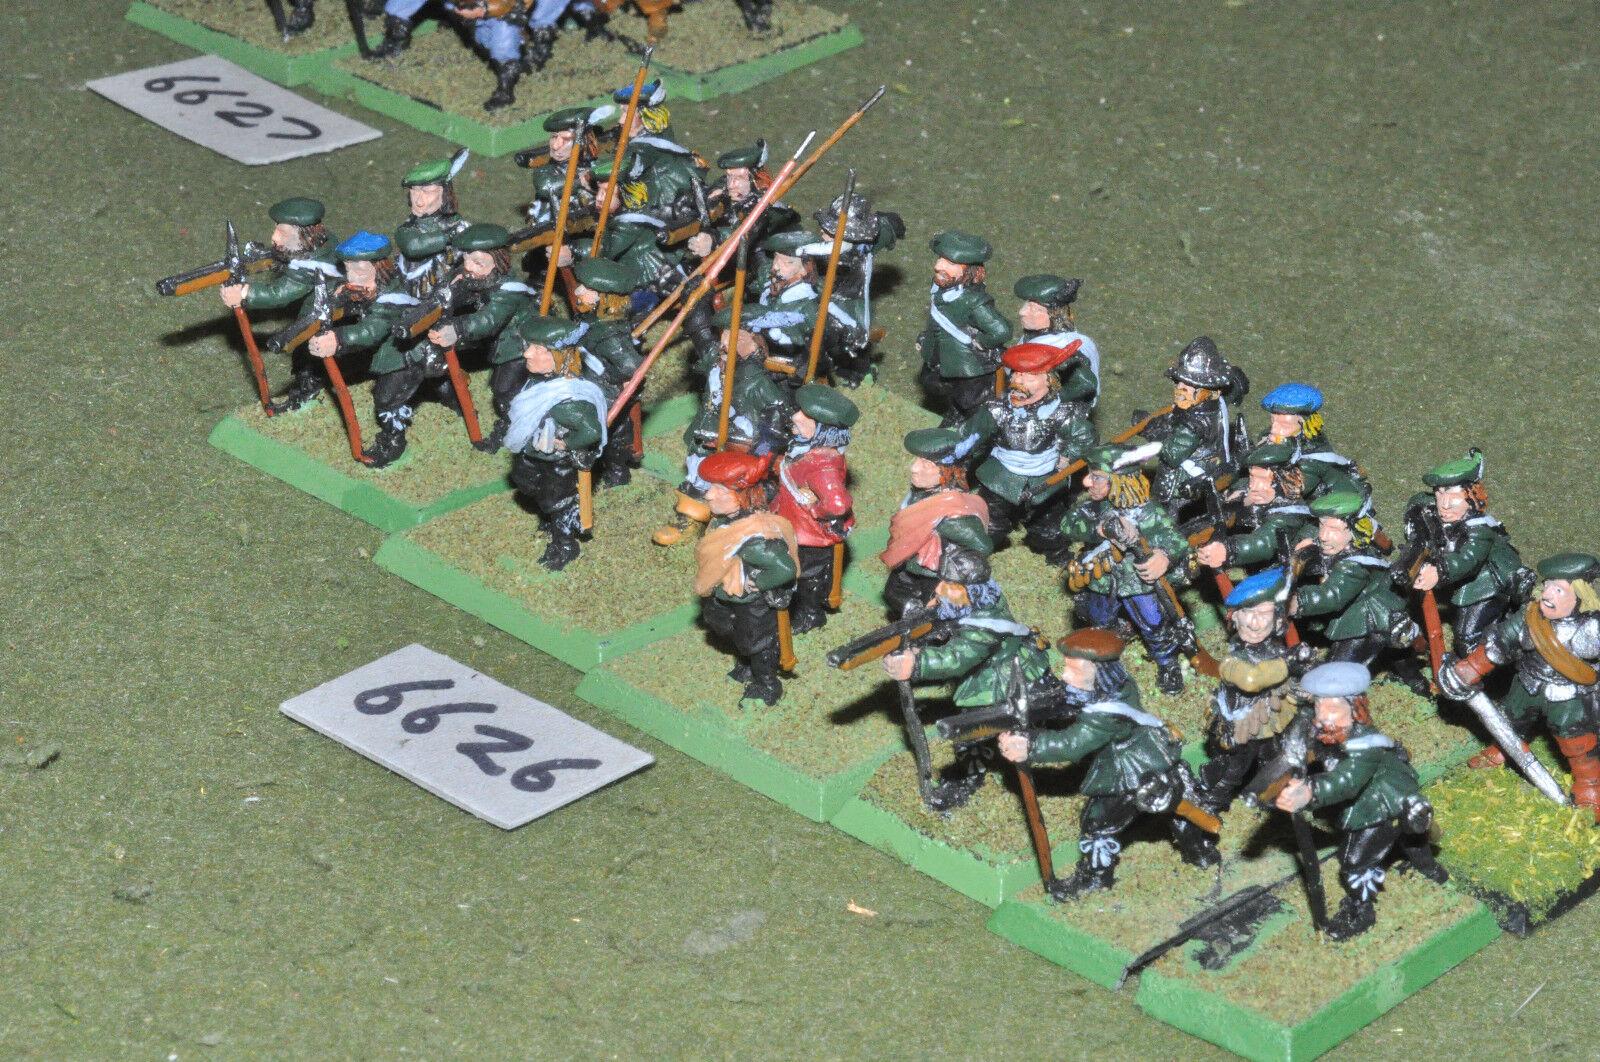 25mm Ecw inglés-Guerra Civil Infantería 30 Figuras De Metal-INF (6626)